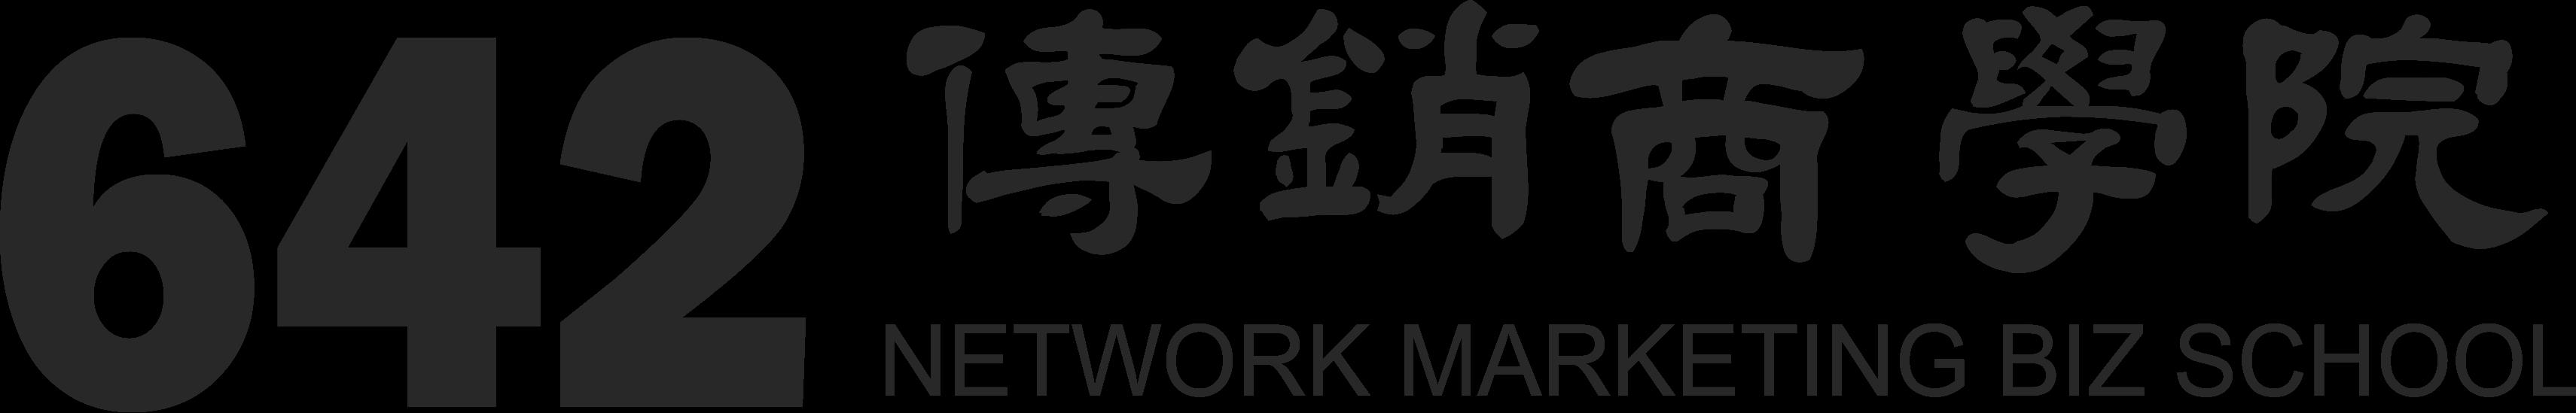 642 Network Marketing Biz School